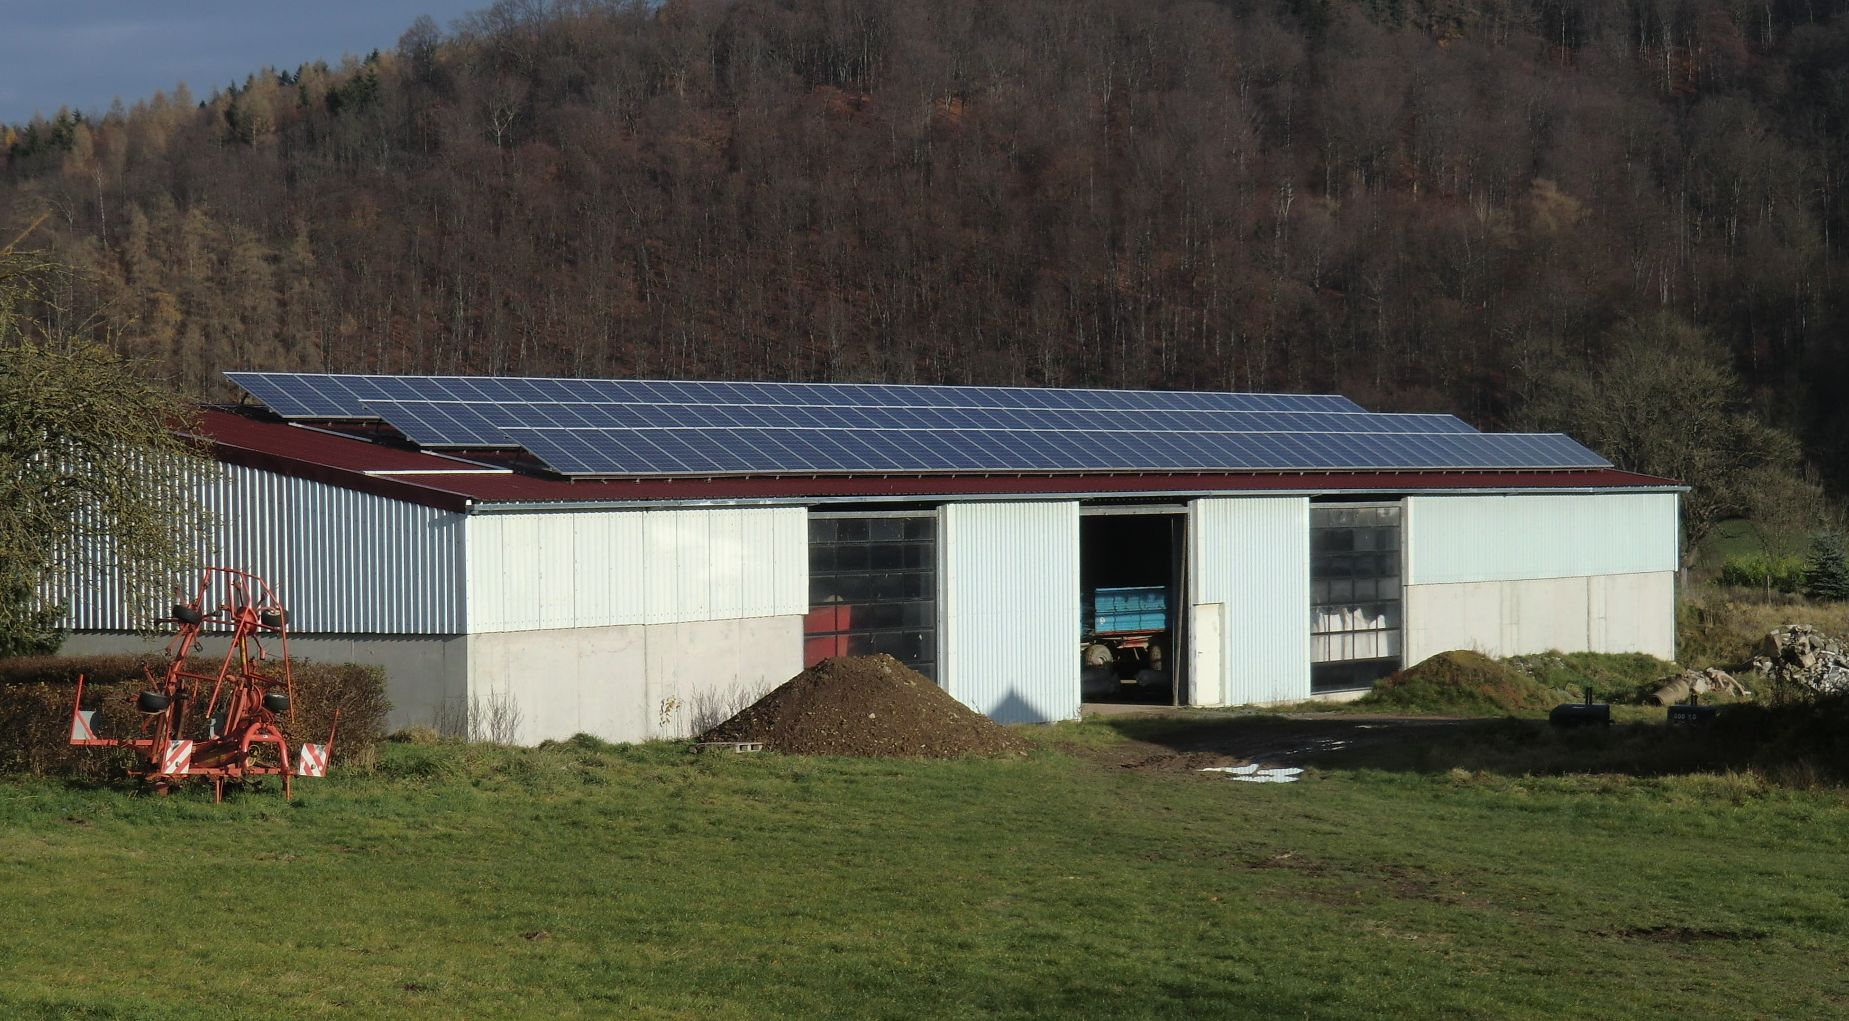 Henke Solartechnik - Photovoltaik – Anlage 31,70 kWp in Emmerthal bei Hameln (Landkreis Hameln-Pyrmont)